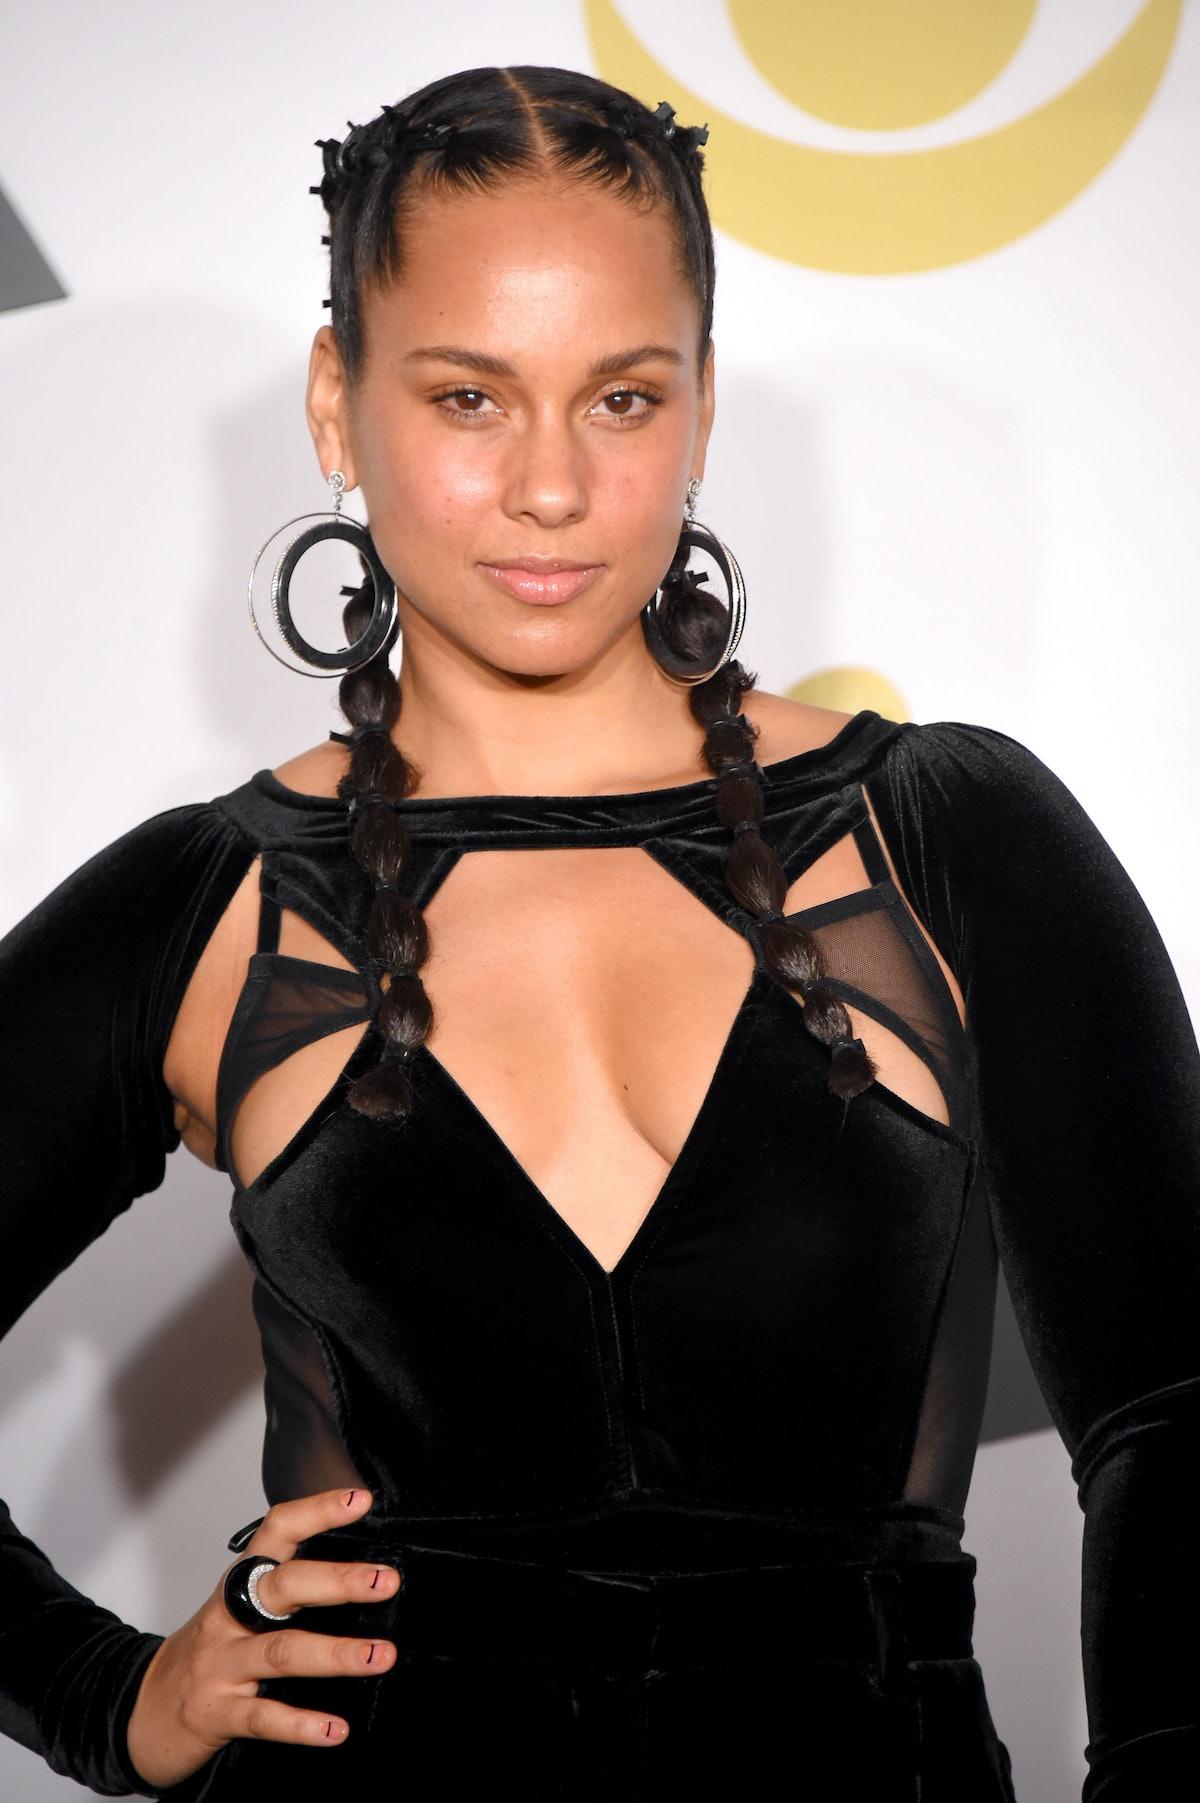 Alicia Keys' New Short Red Hair Proves She's A Girl On Fire